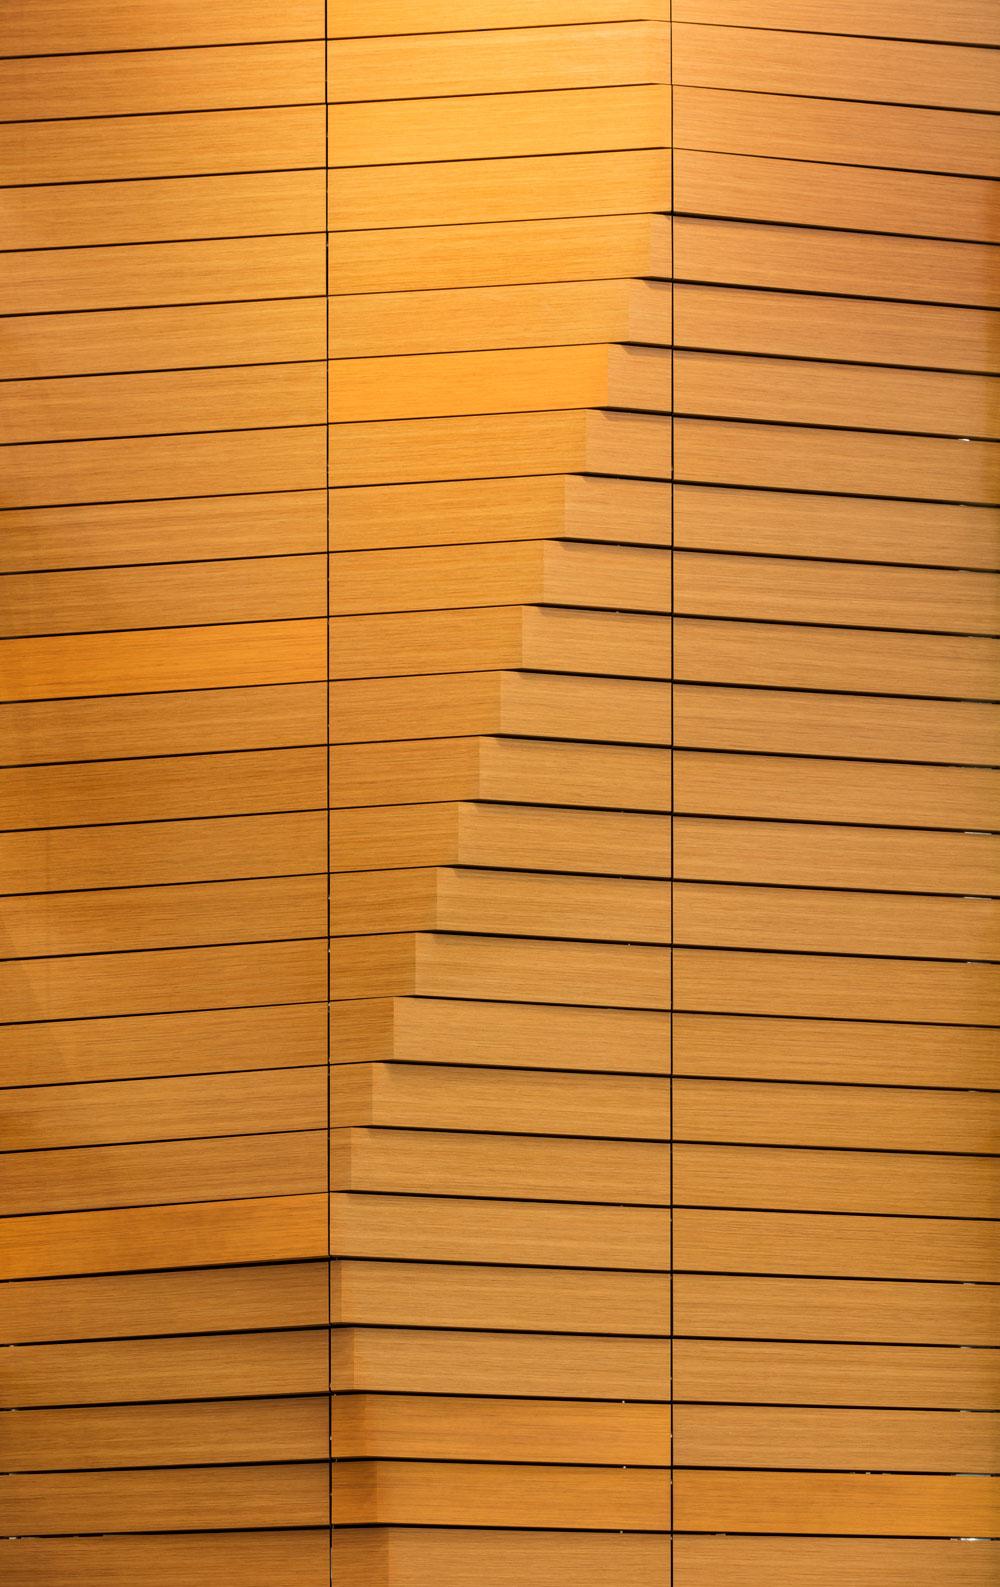 Wood wall detail.